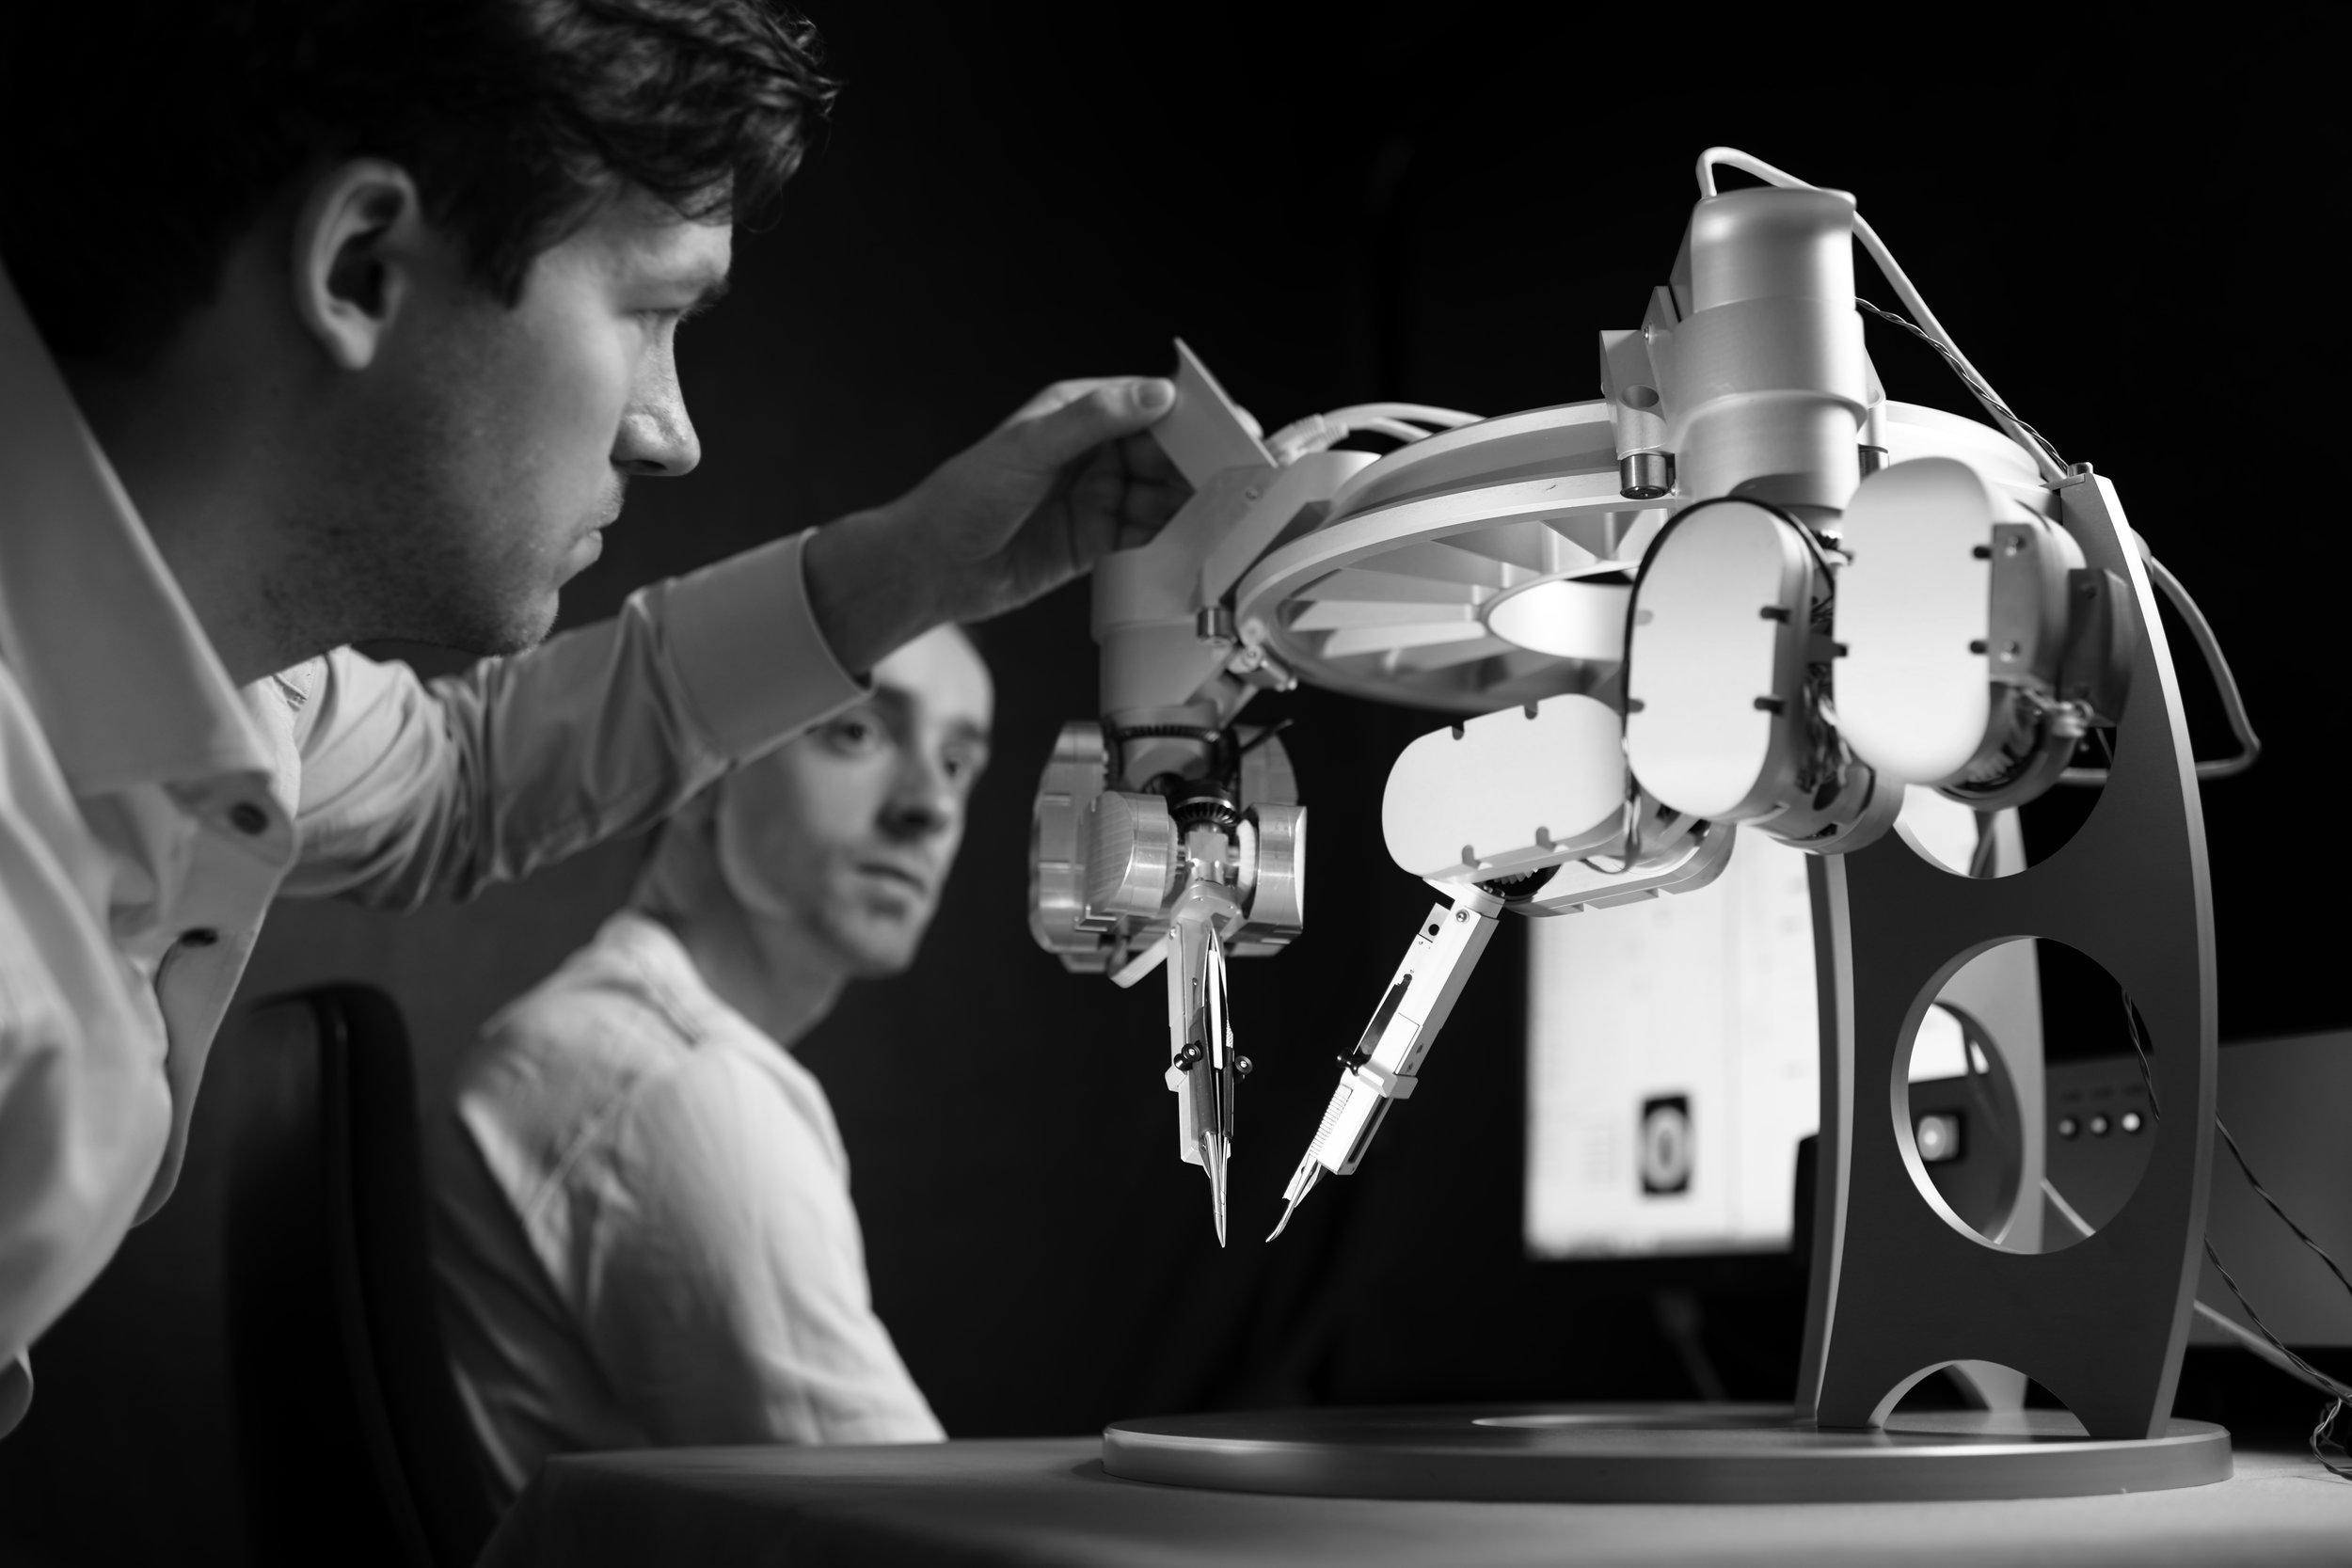 BvOF 2014_0207_FPcrop rechten TUe microsurgical robot.jpg